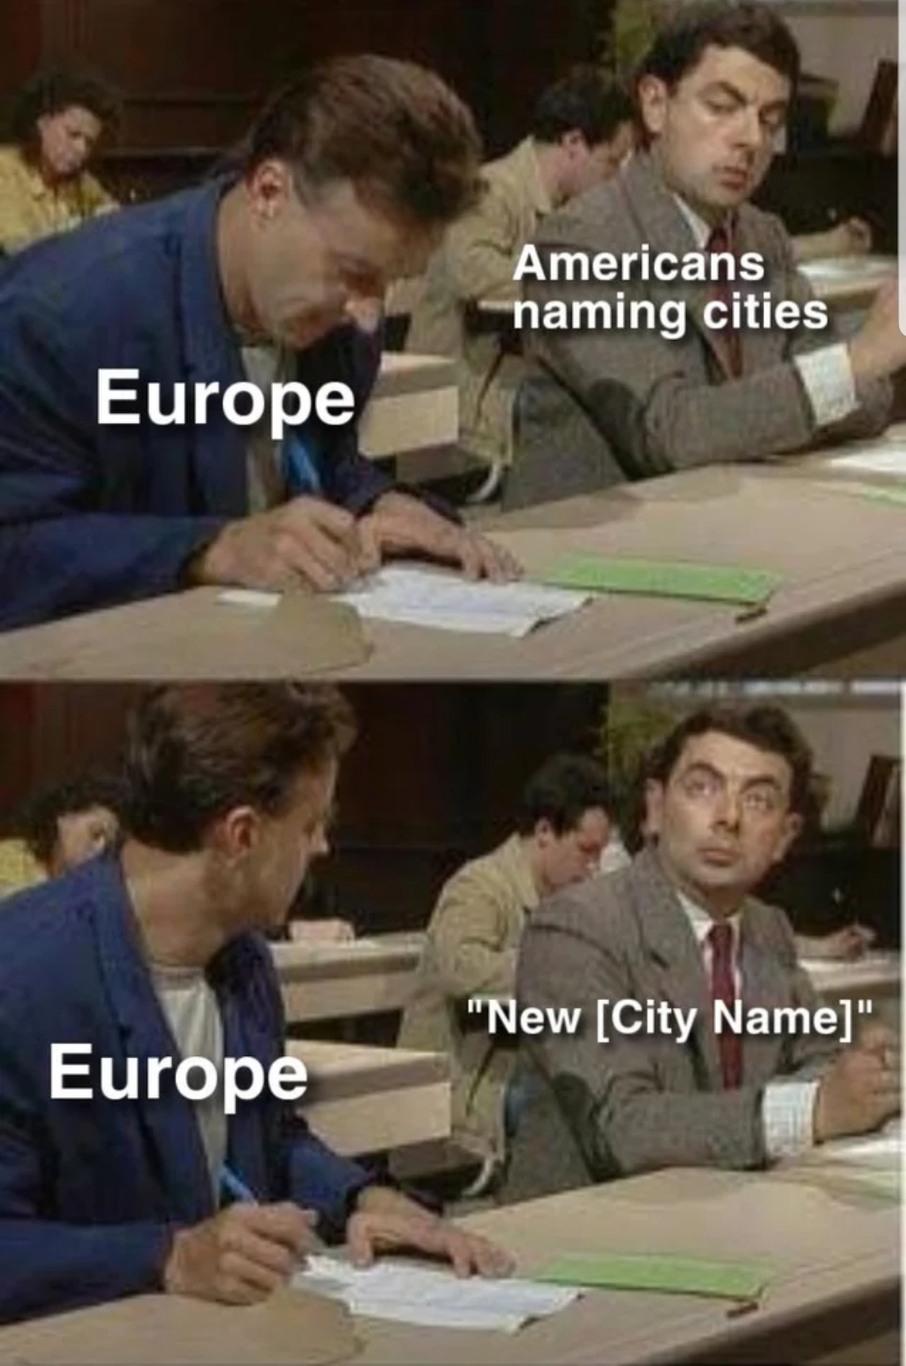 It's new free real estate - meme